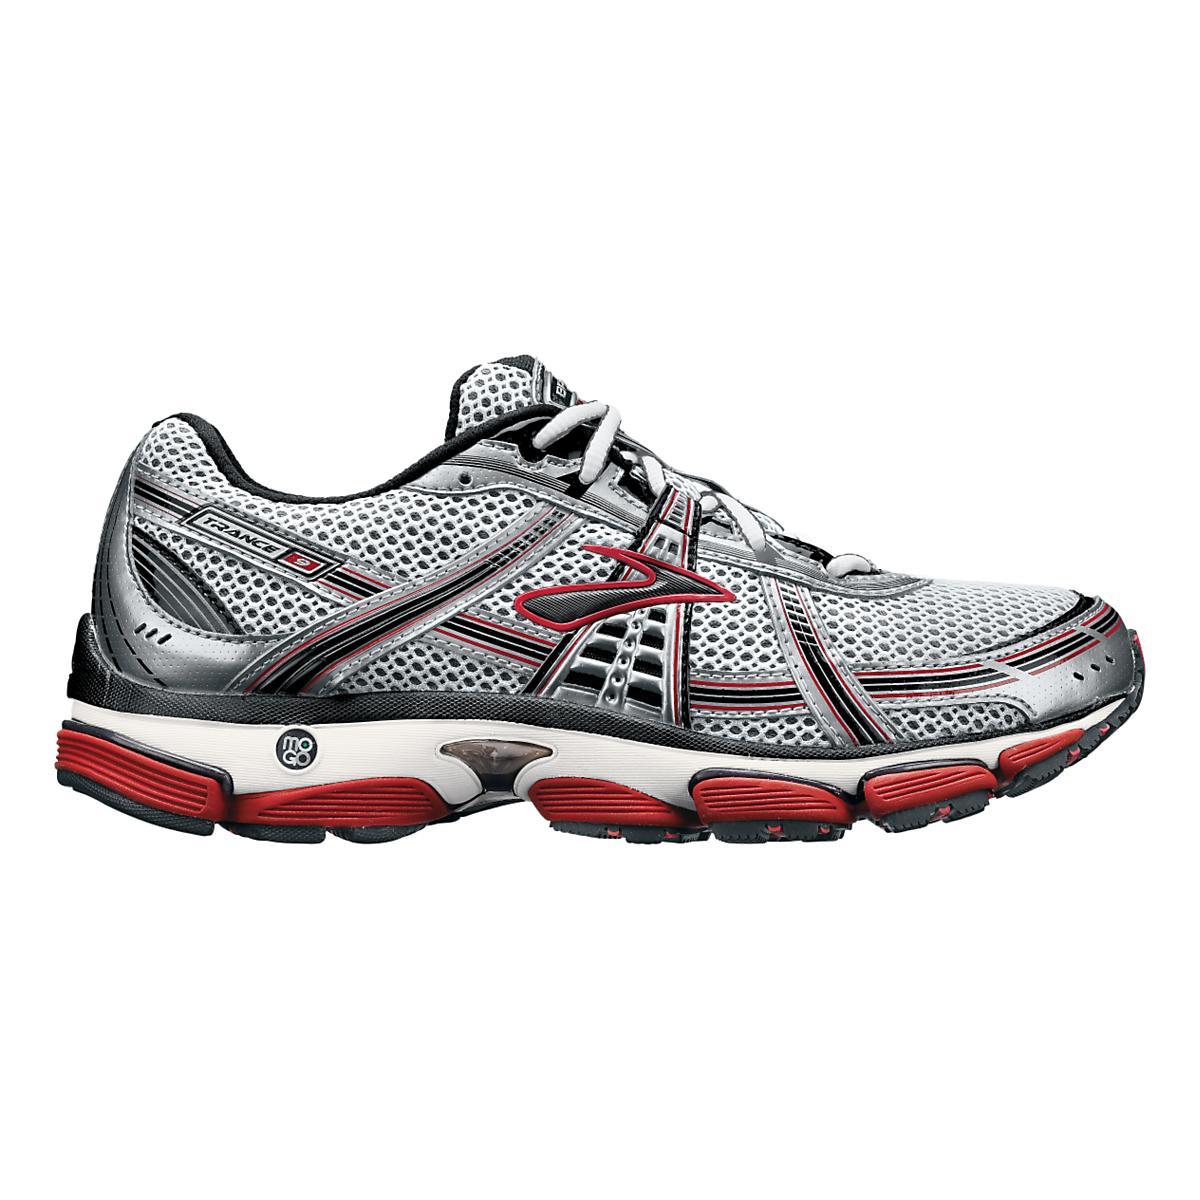 ef3f4e7df9c Mens Brooks Trance 9 Running Shoe at Road Runner Sports